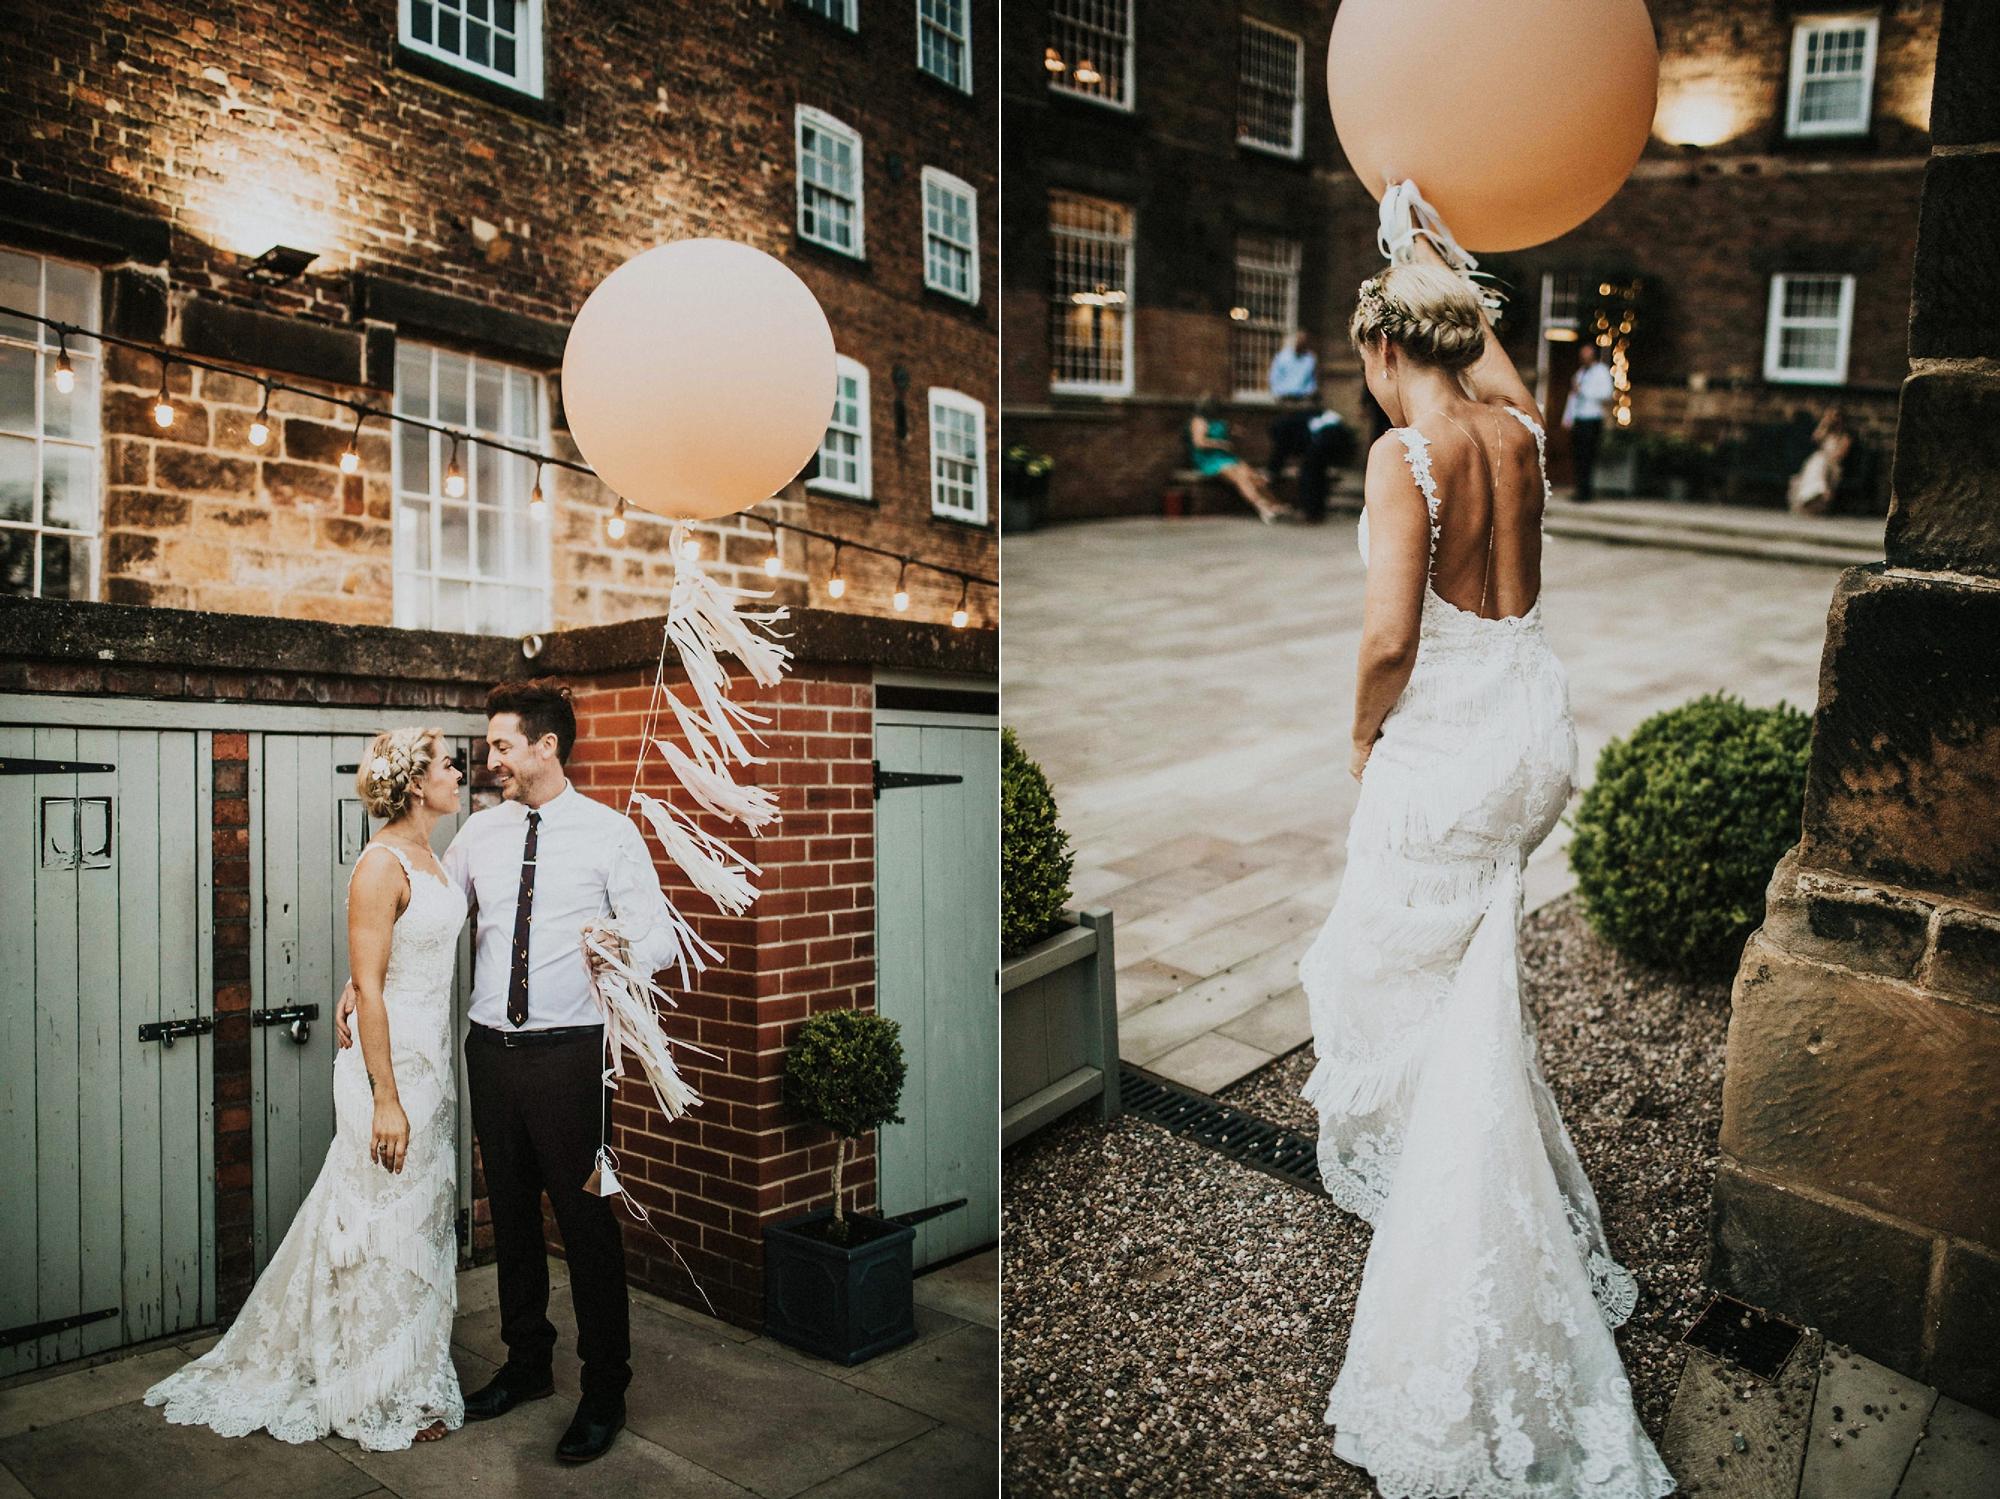 the_west_mill_derby_wedding_photographer_159 copy.jpg